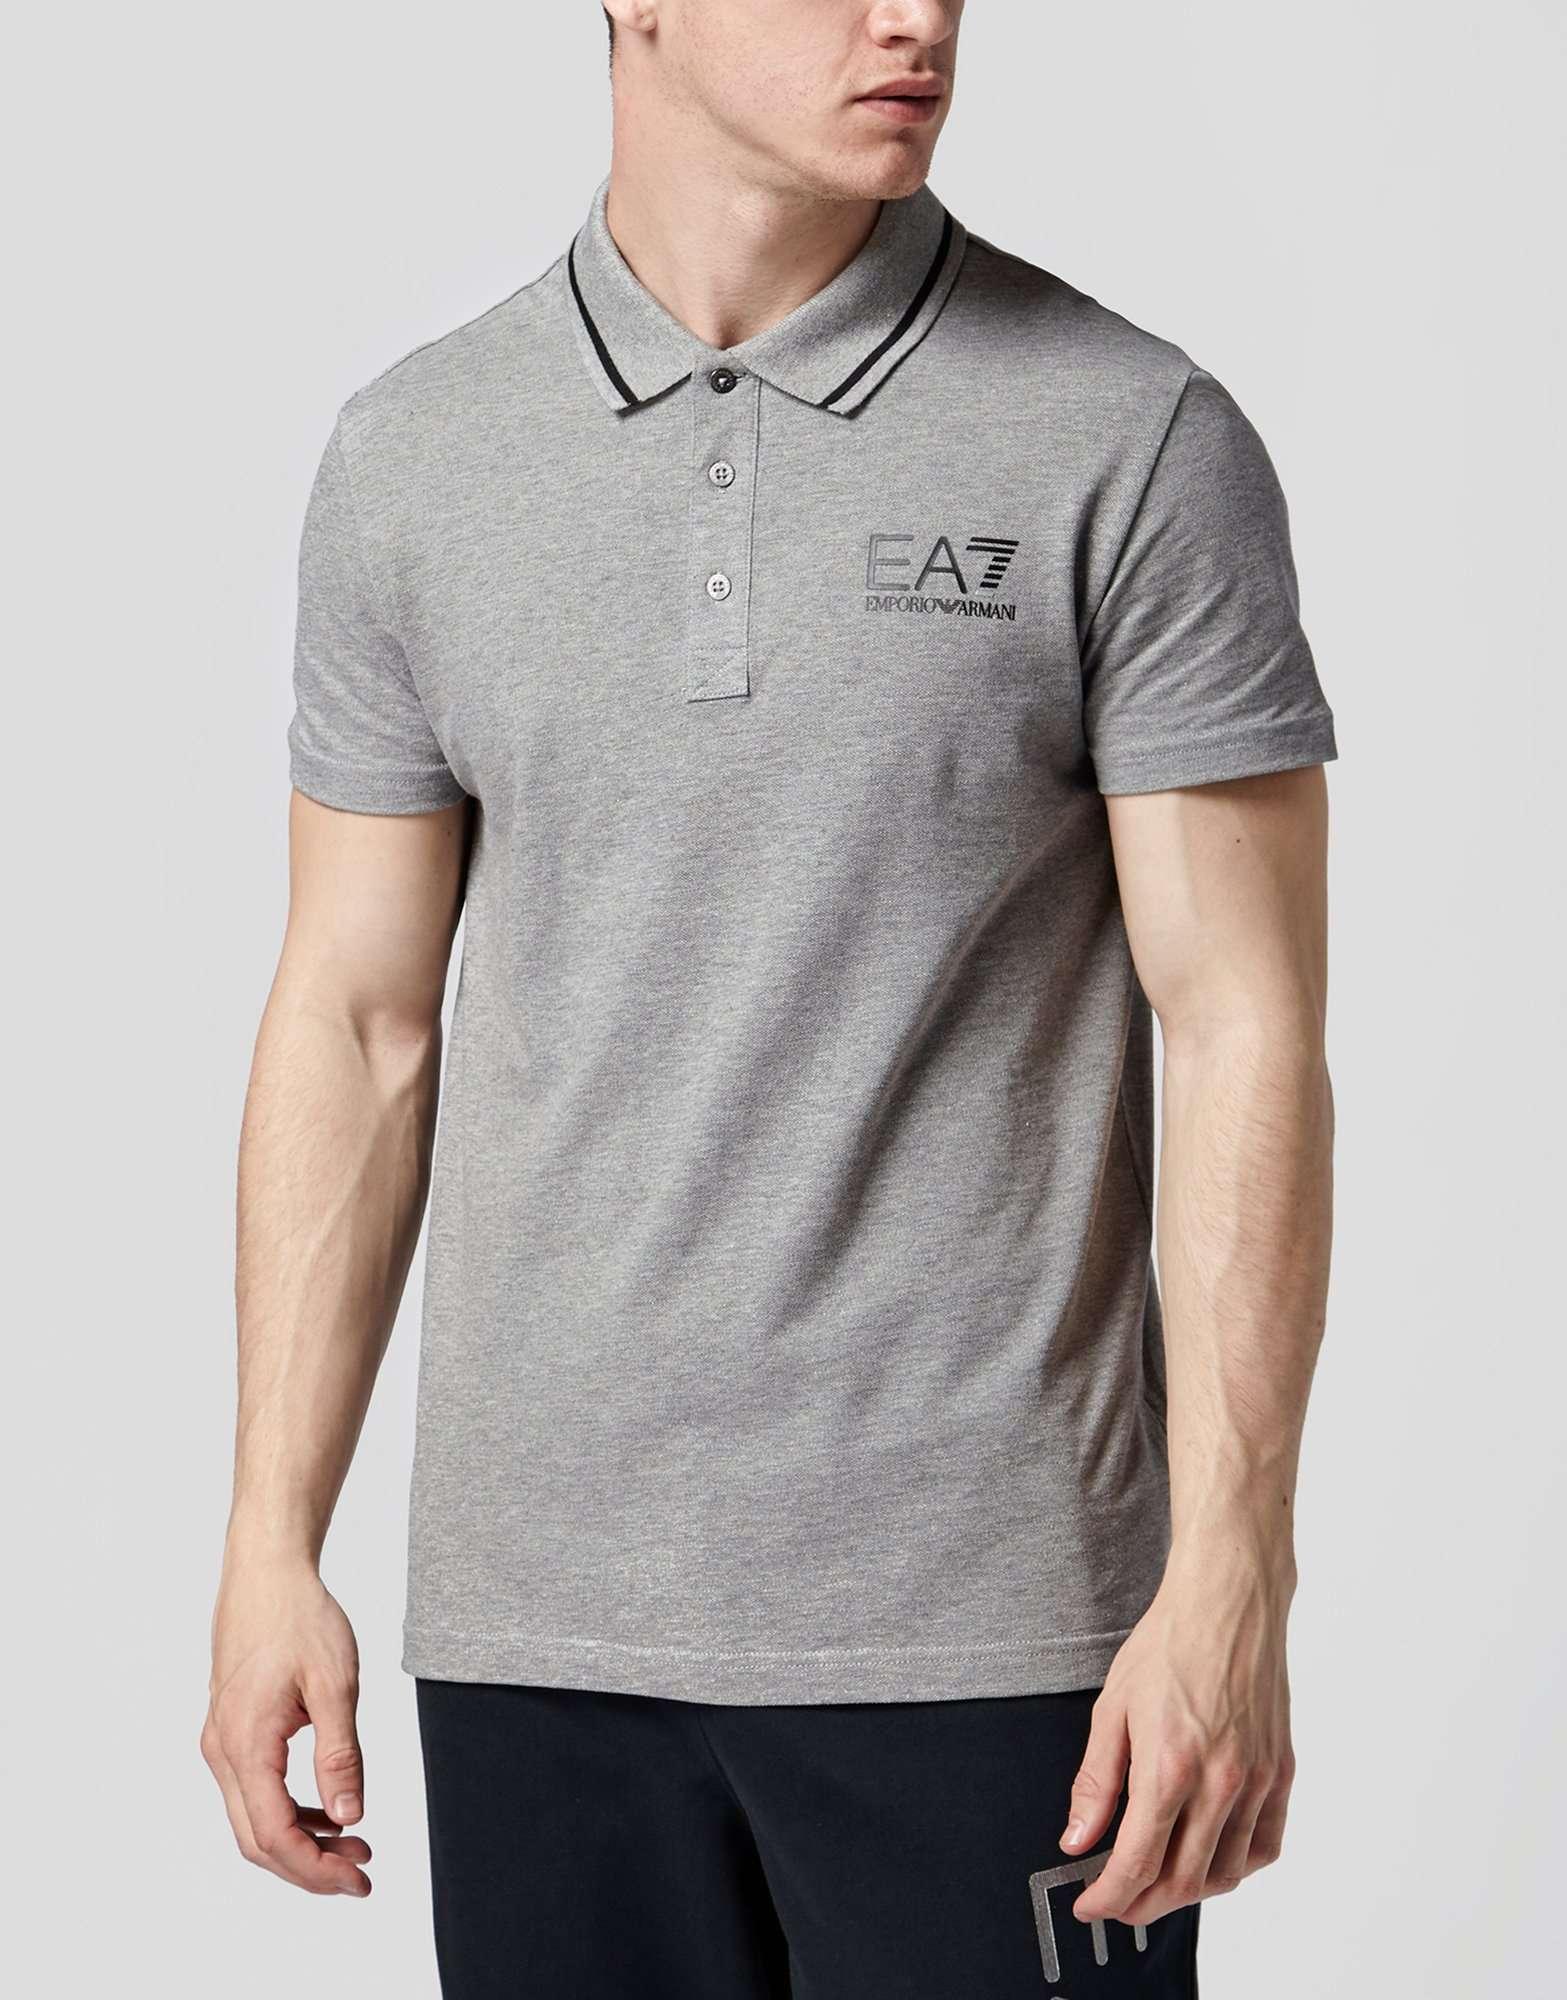 5ee630dd Emporio Armani EA7 Core ID Pique Polo Shirt | scotts Menswear